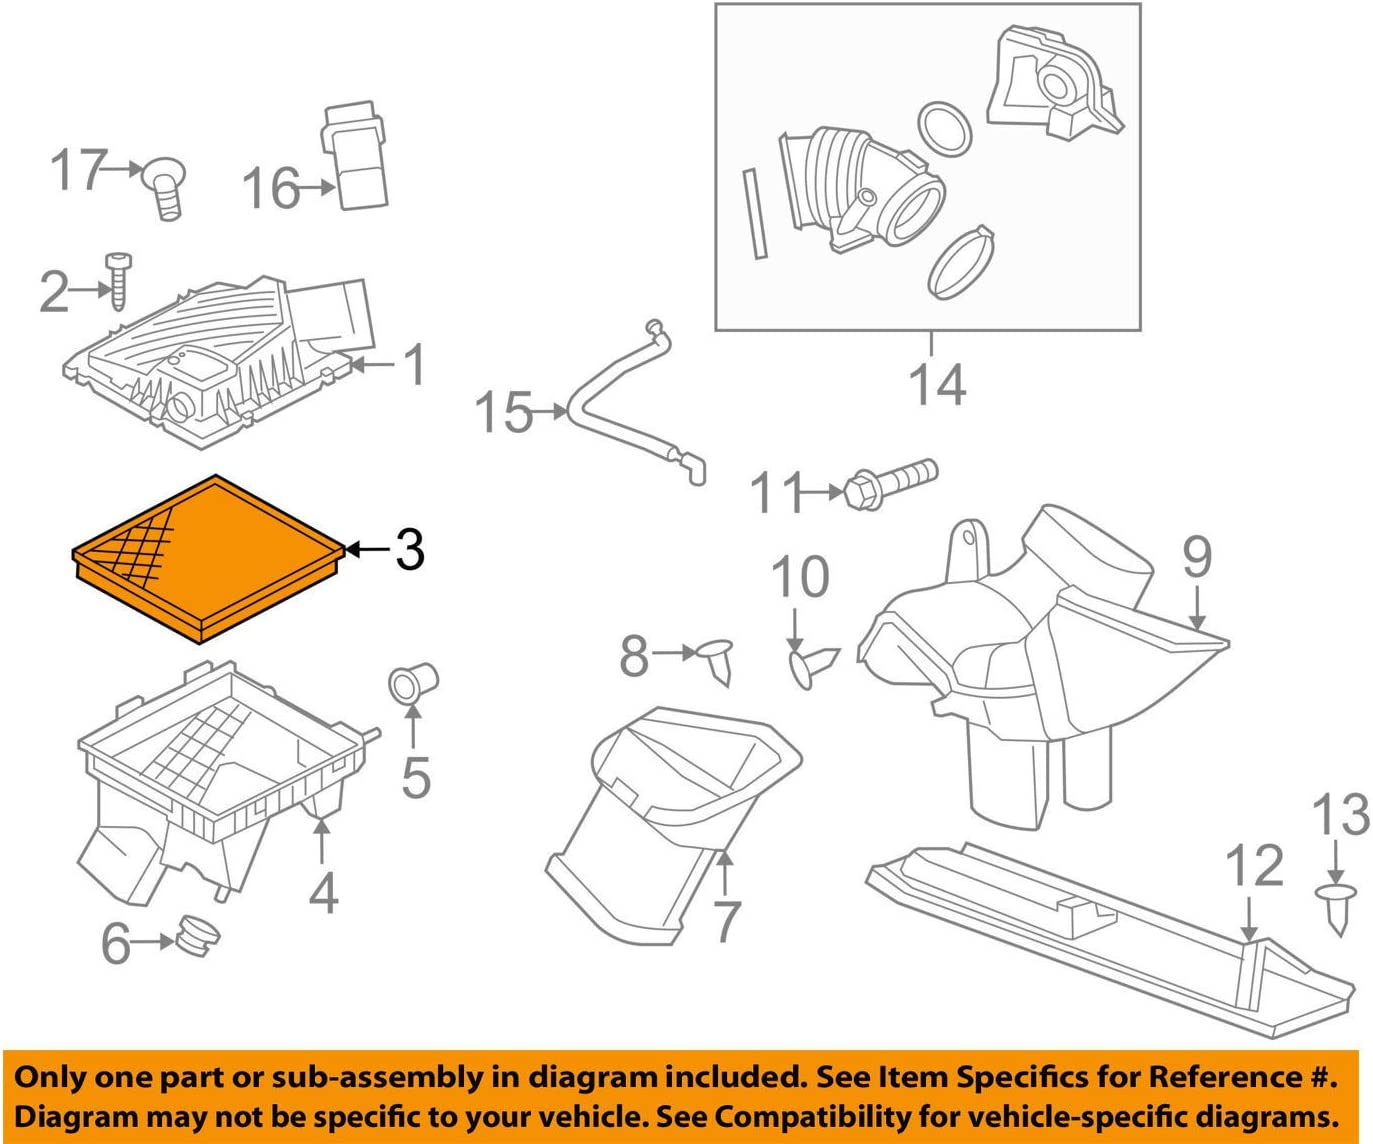 55560894 New Engine Air Filter For Impala Malibu Saab 9-5 Regal LaCrosse Regal